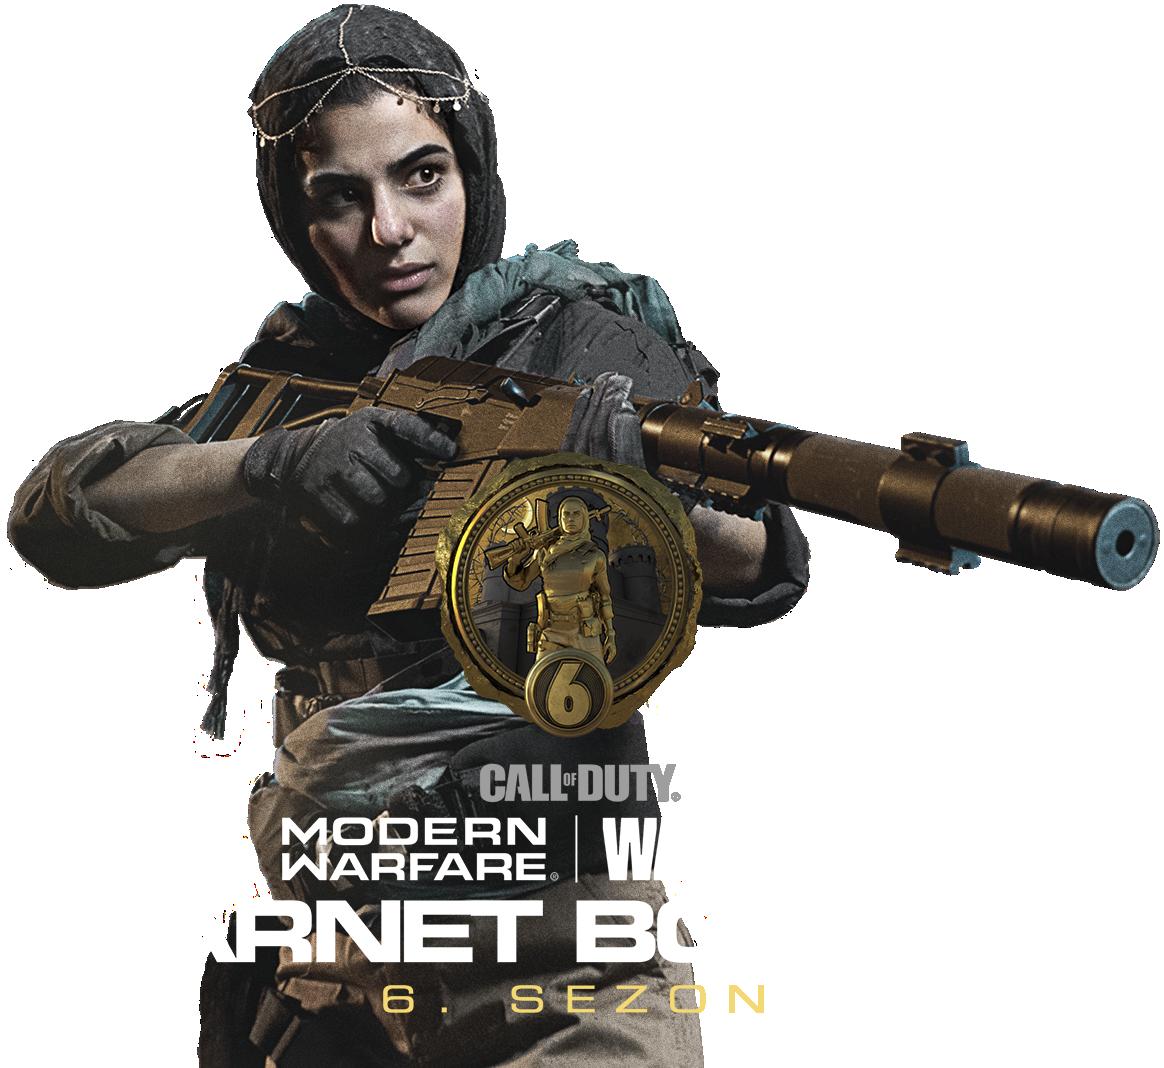 Karnet bojowy Call of Duty Modern Warfare